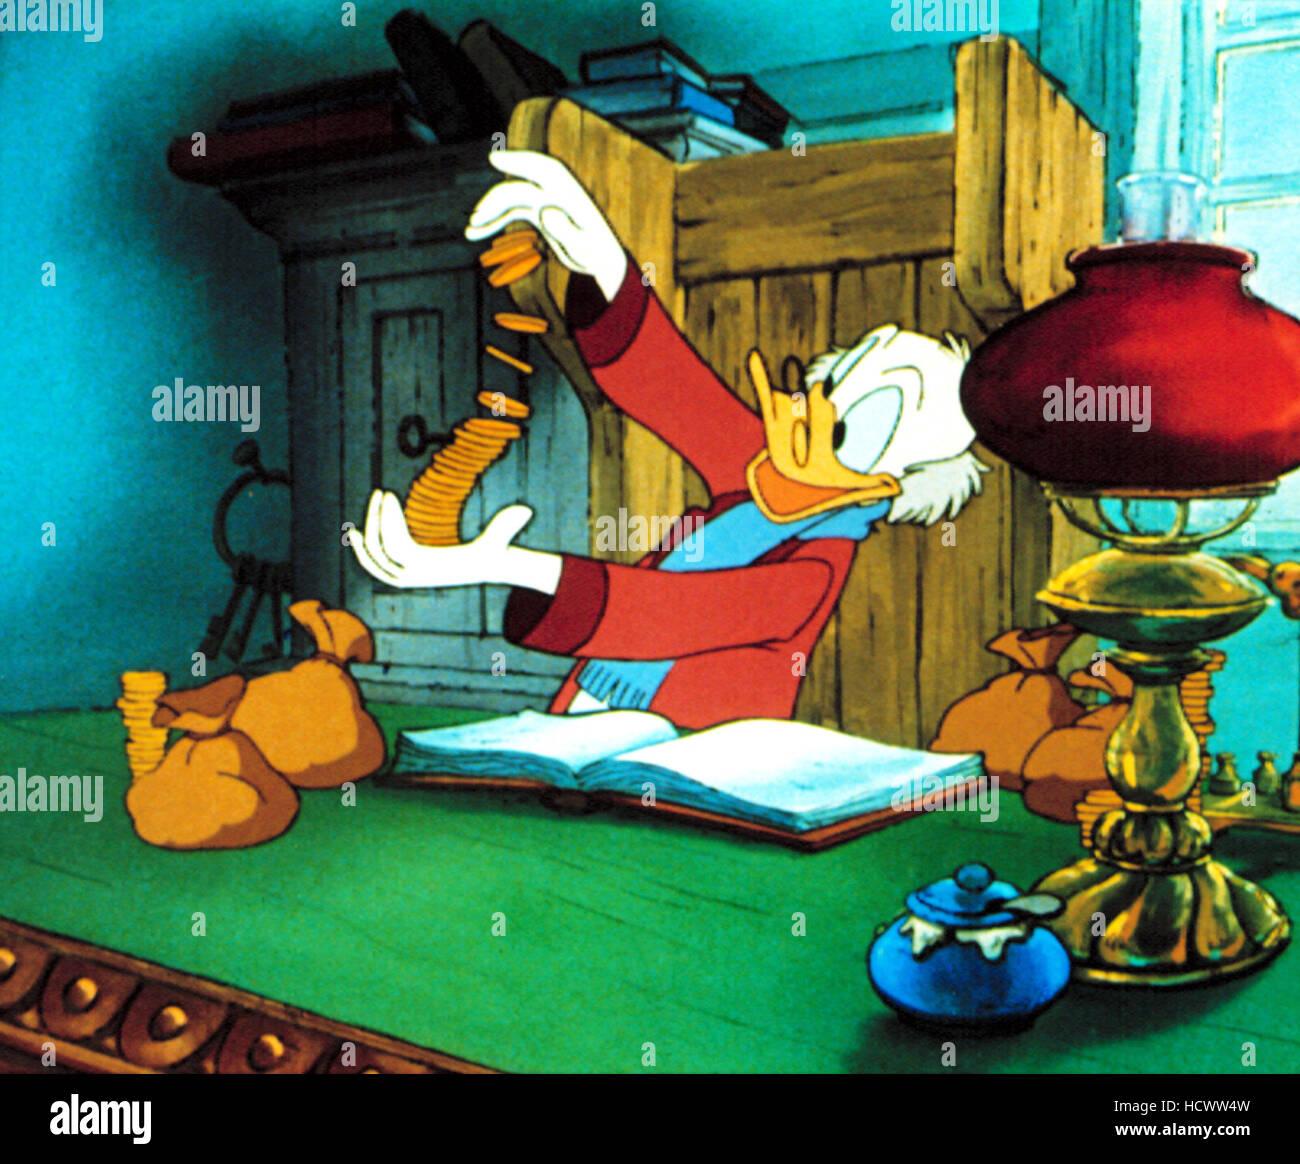 Scrooge Mcduck Christmas Carol.Mickey S Christmas Carol Scrooge Mcduck 1983 Photo